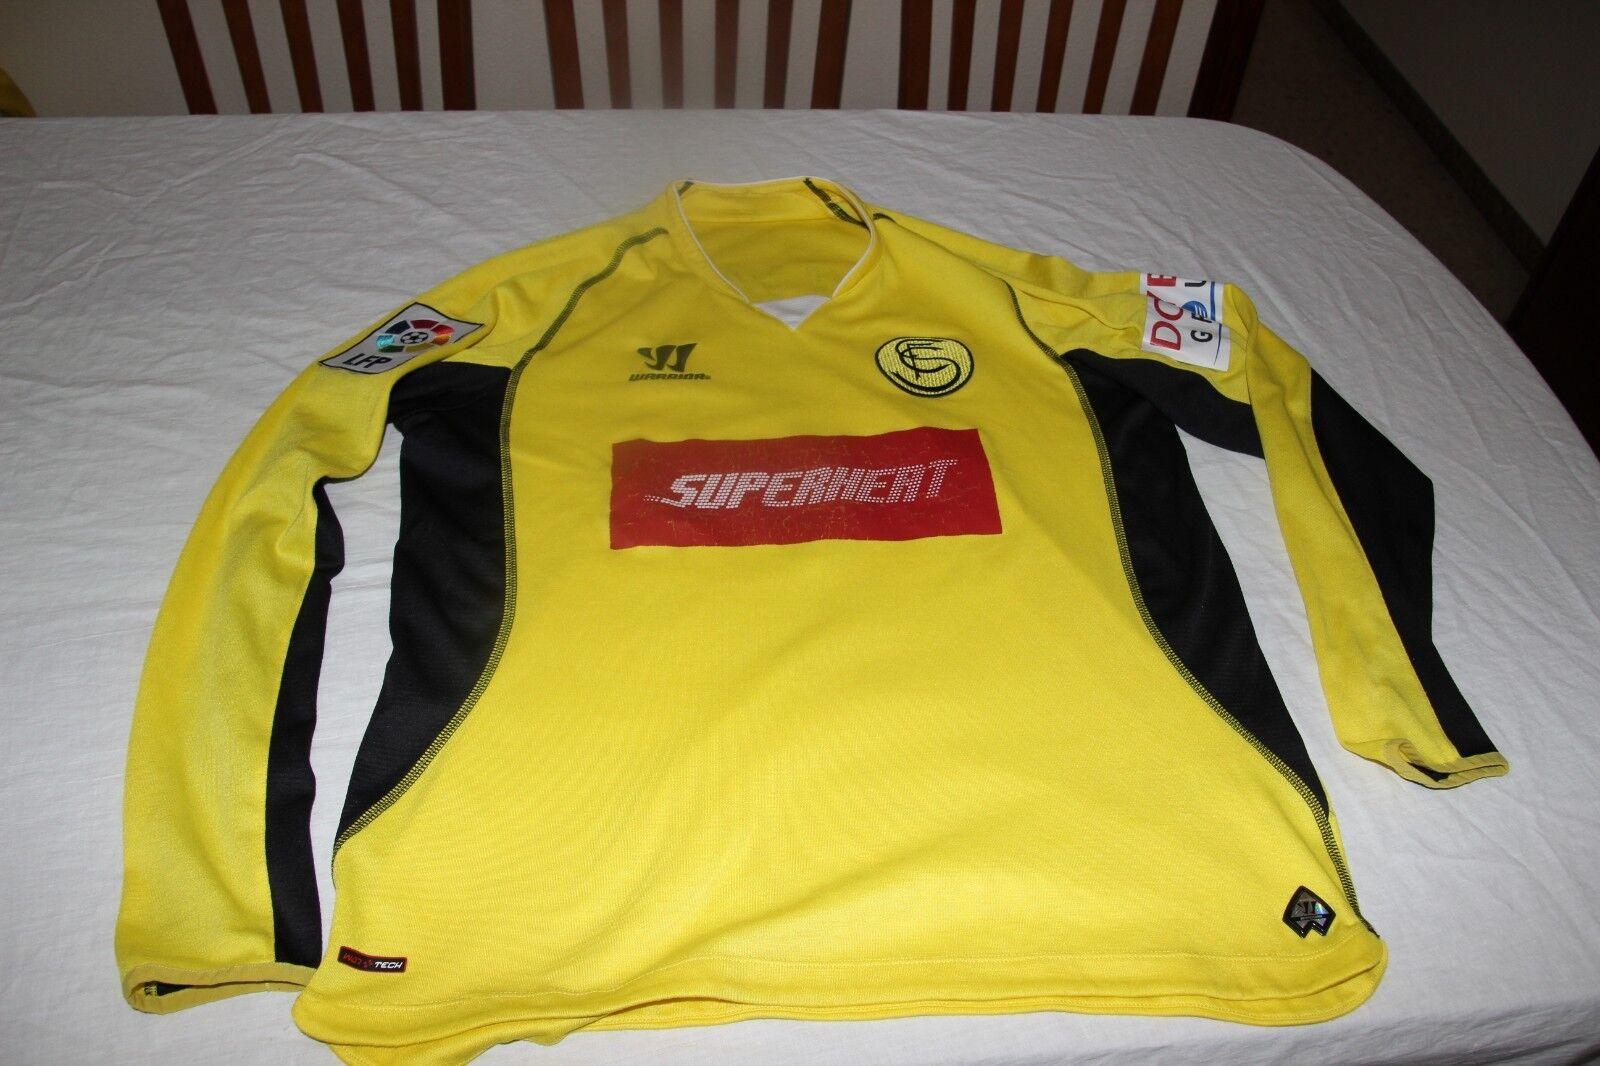 CAMISETA OFICIAL SEVILLA FC WARRIOR T L SUPERHERT MATCH WORN Nº 1 JAVI VARAS